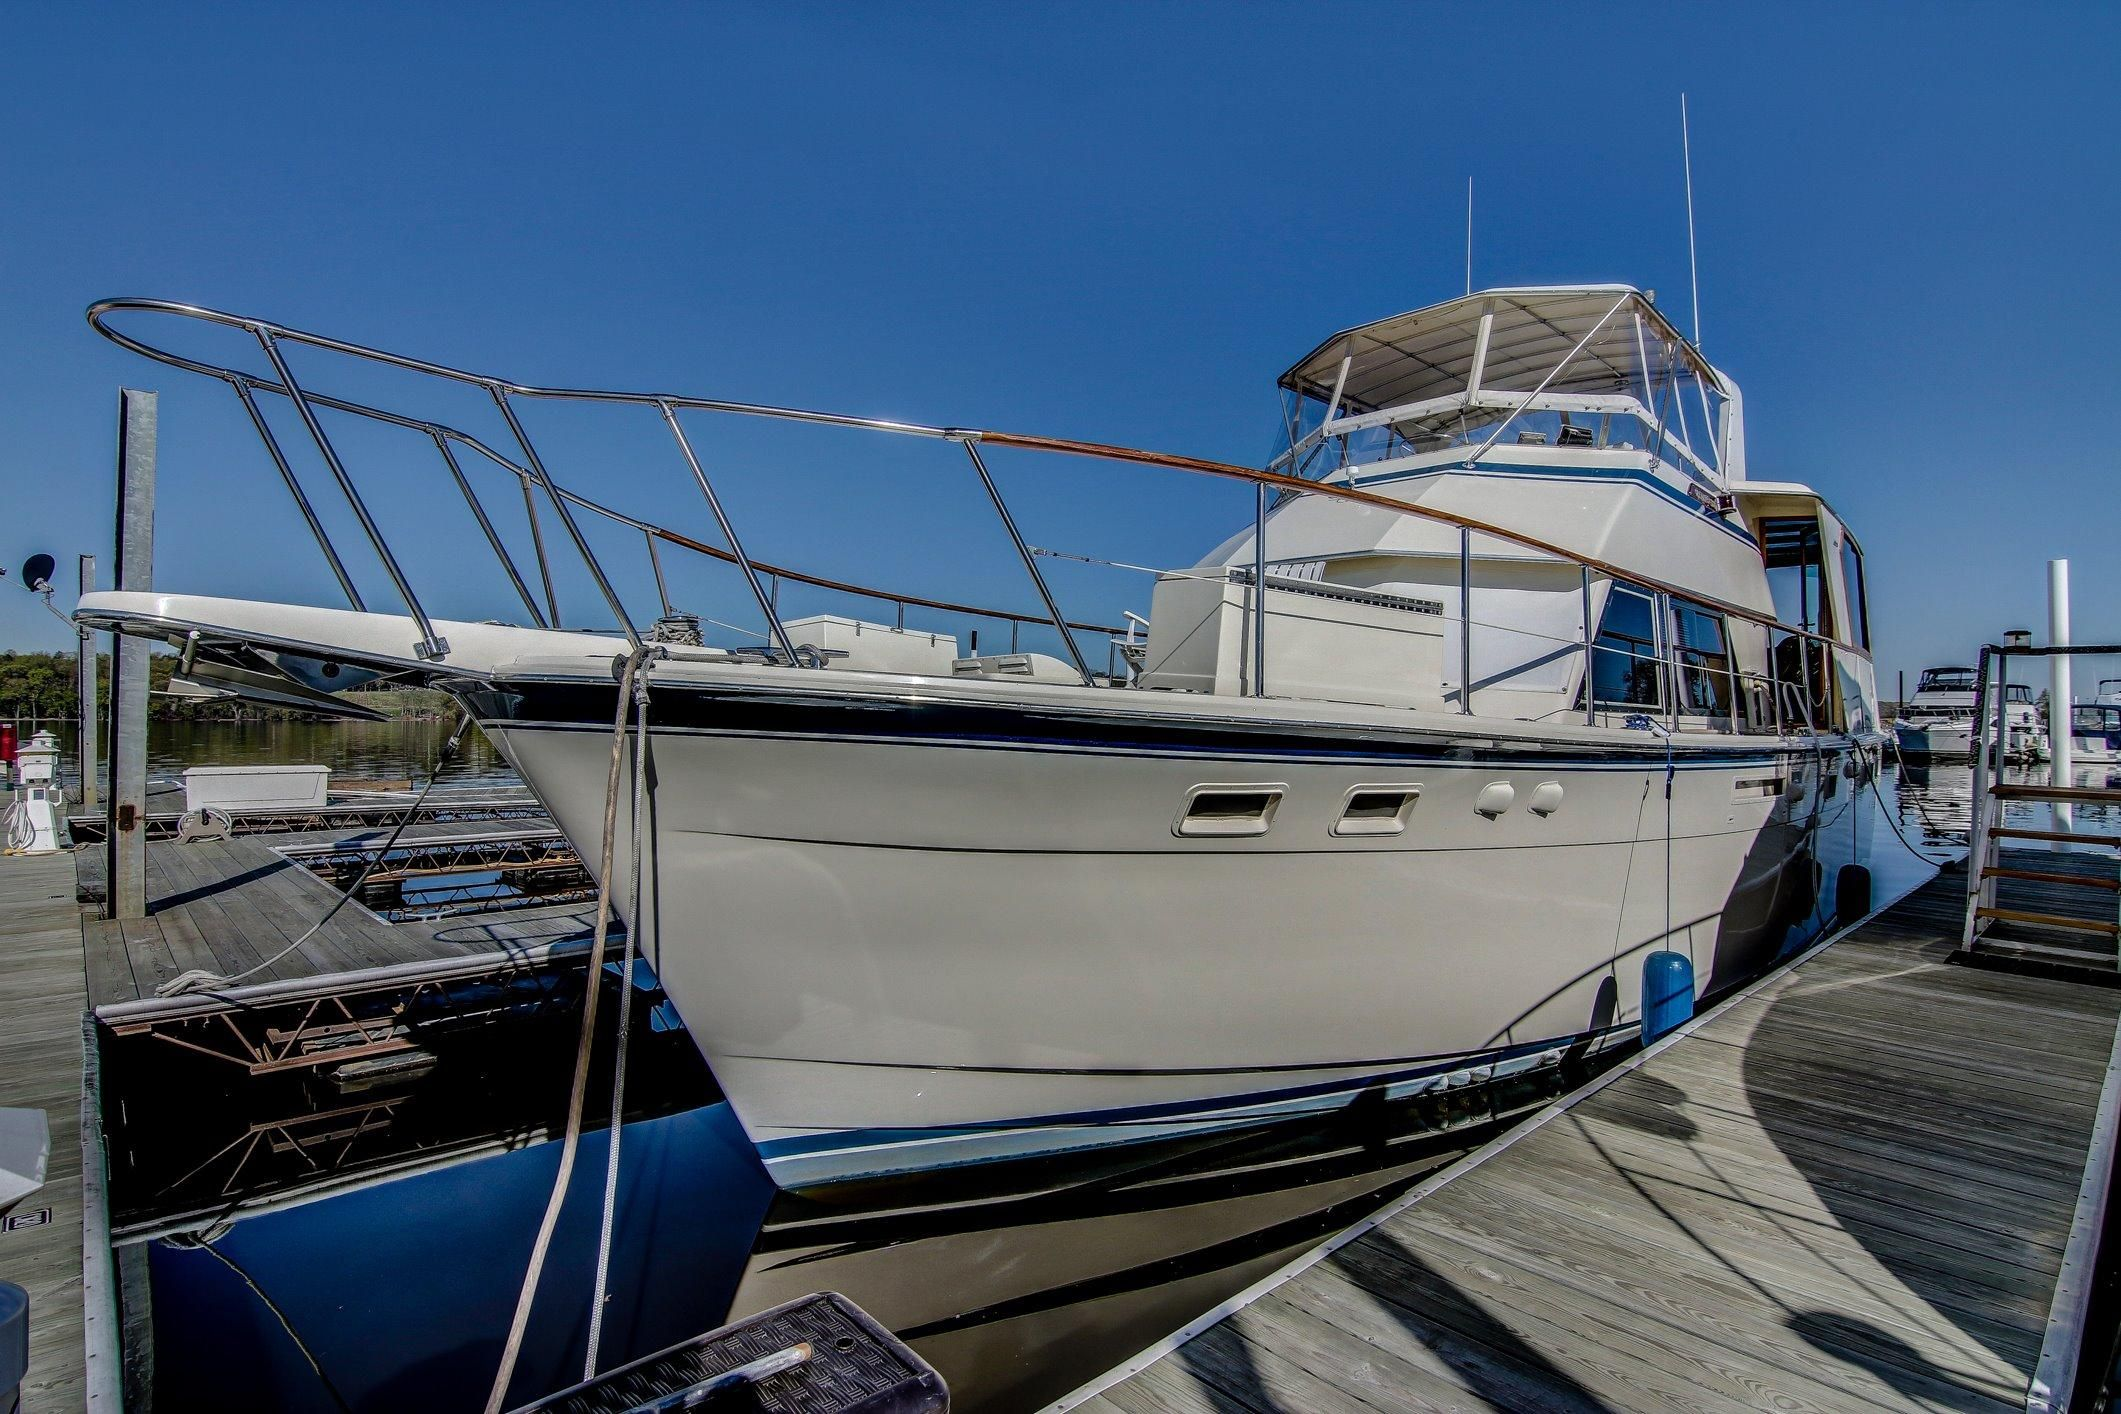 1981 hatteras motor yacht motore barca in vendita www for Metro motor sales minneapolis mn